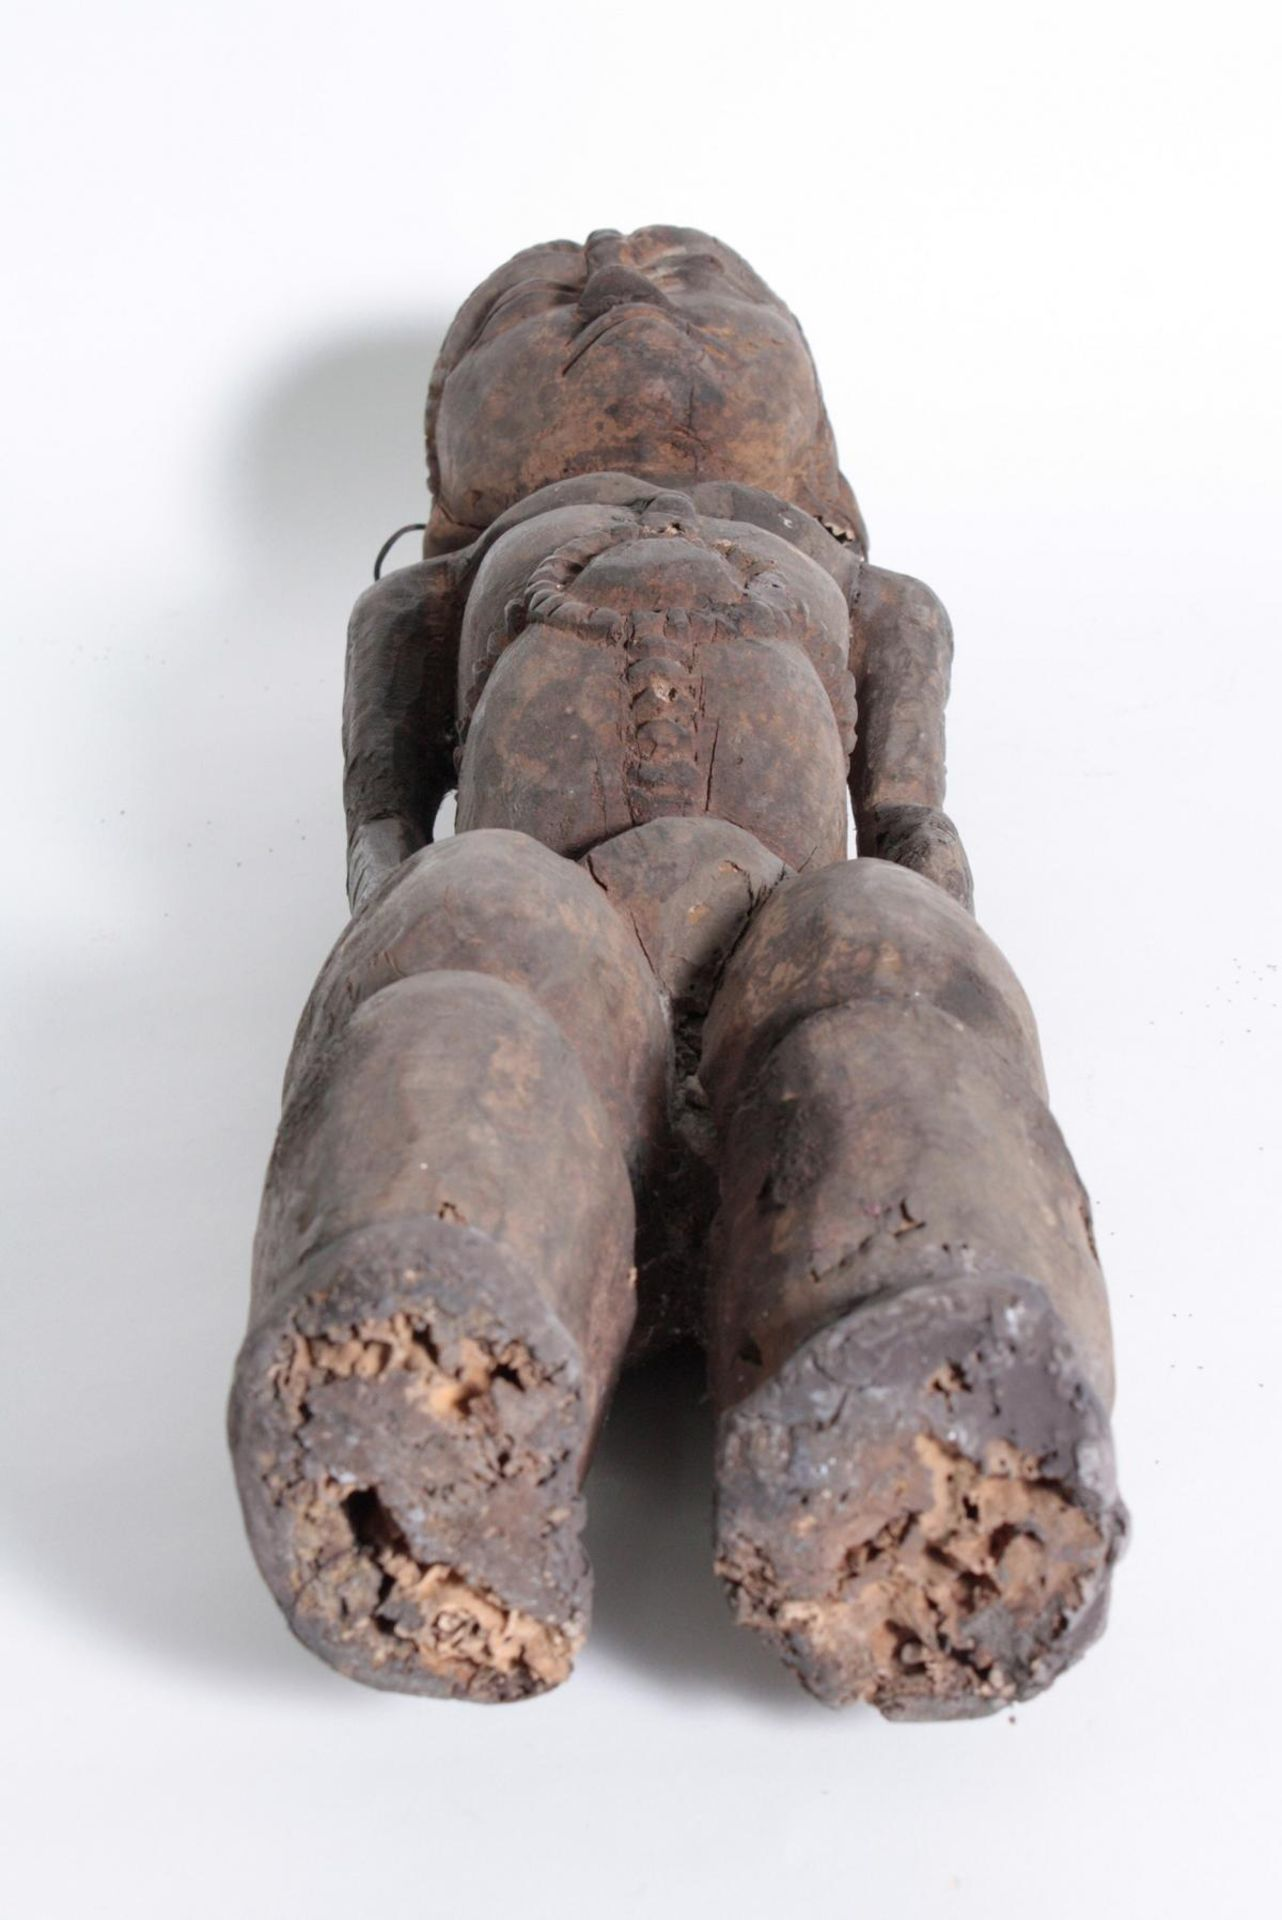 Ältere Ahnen-Figur, Tabwa, D. R. Kongo - Bild 12 aus 14